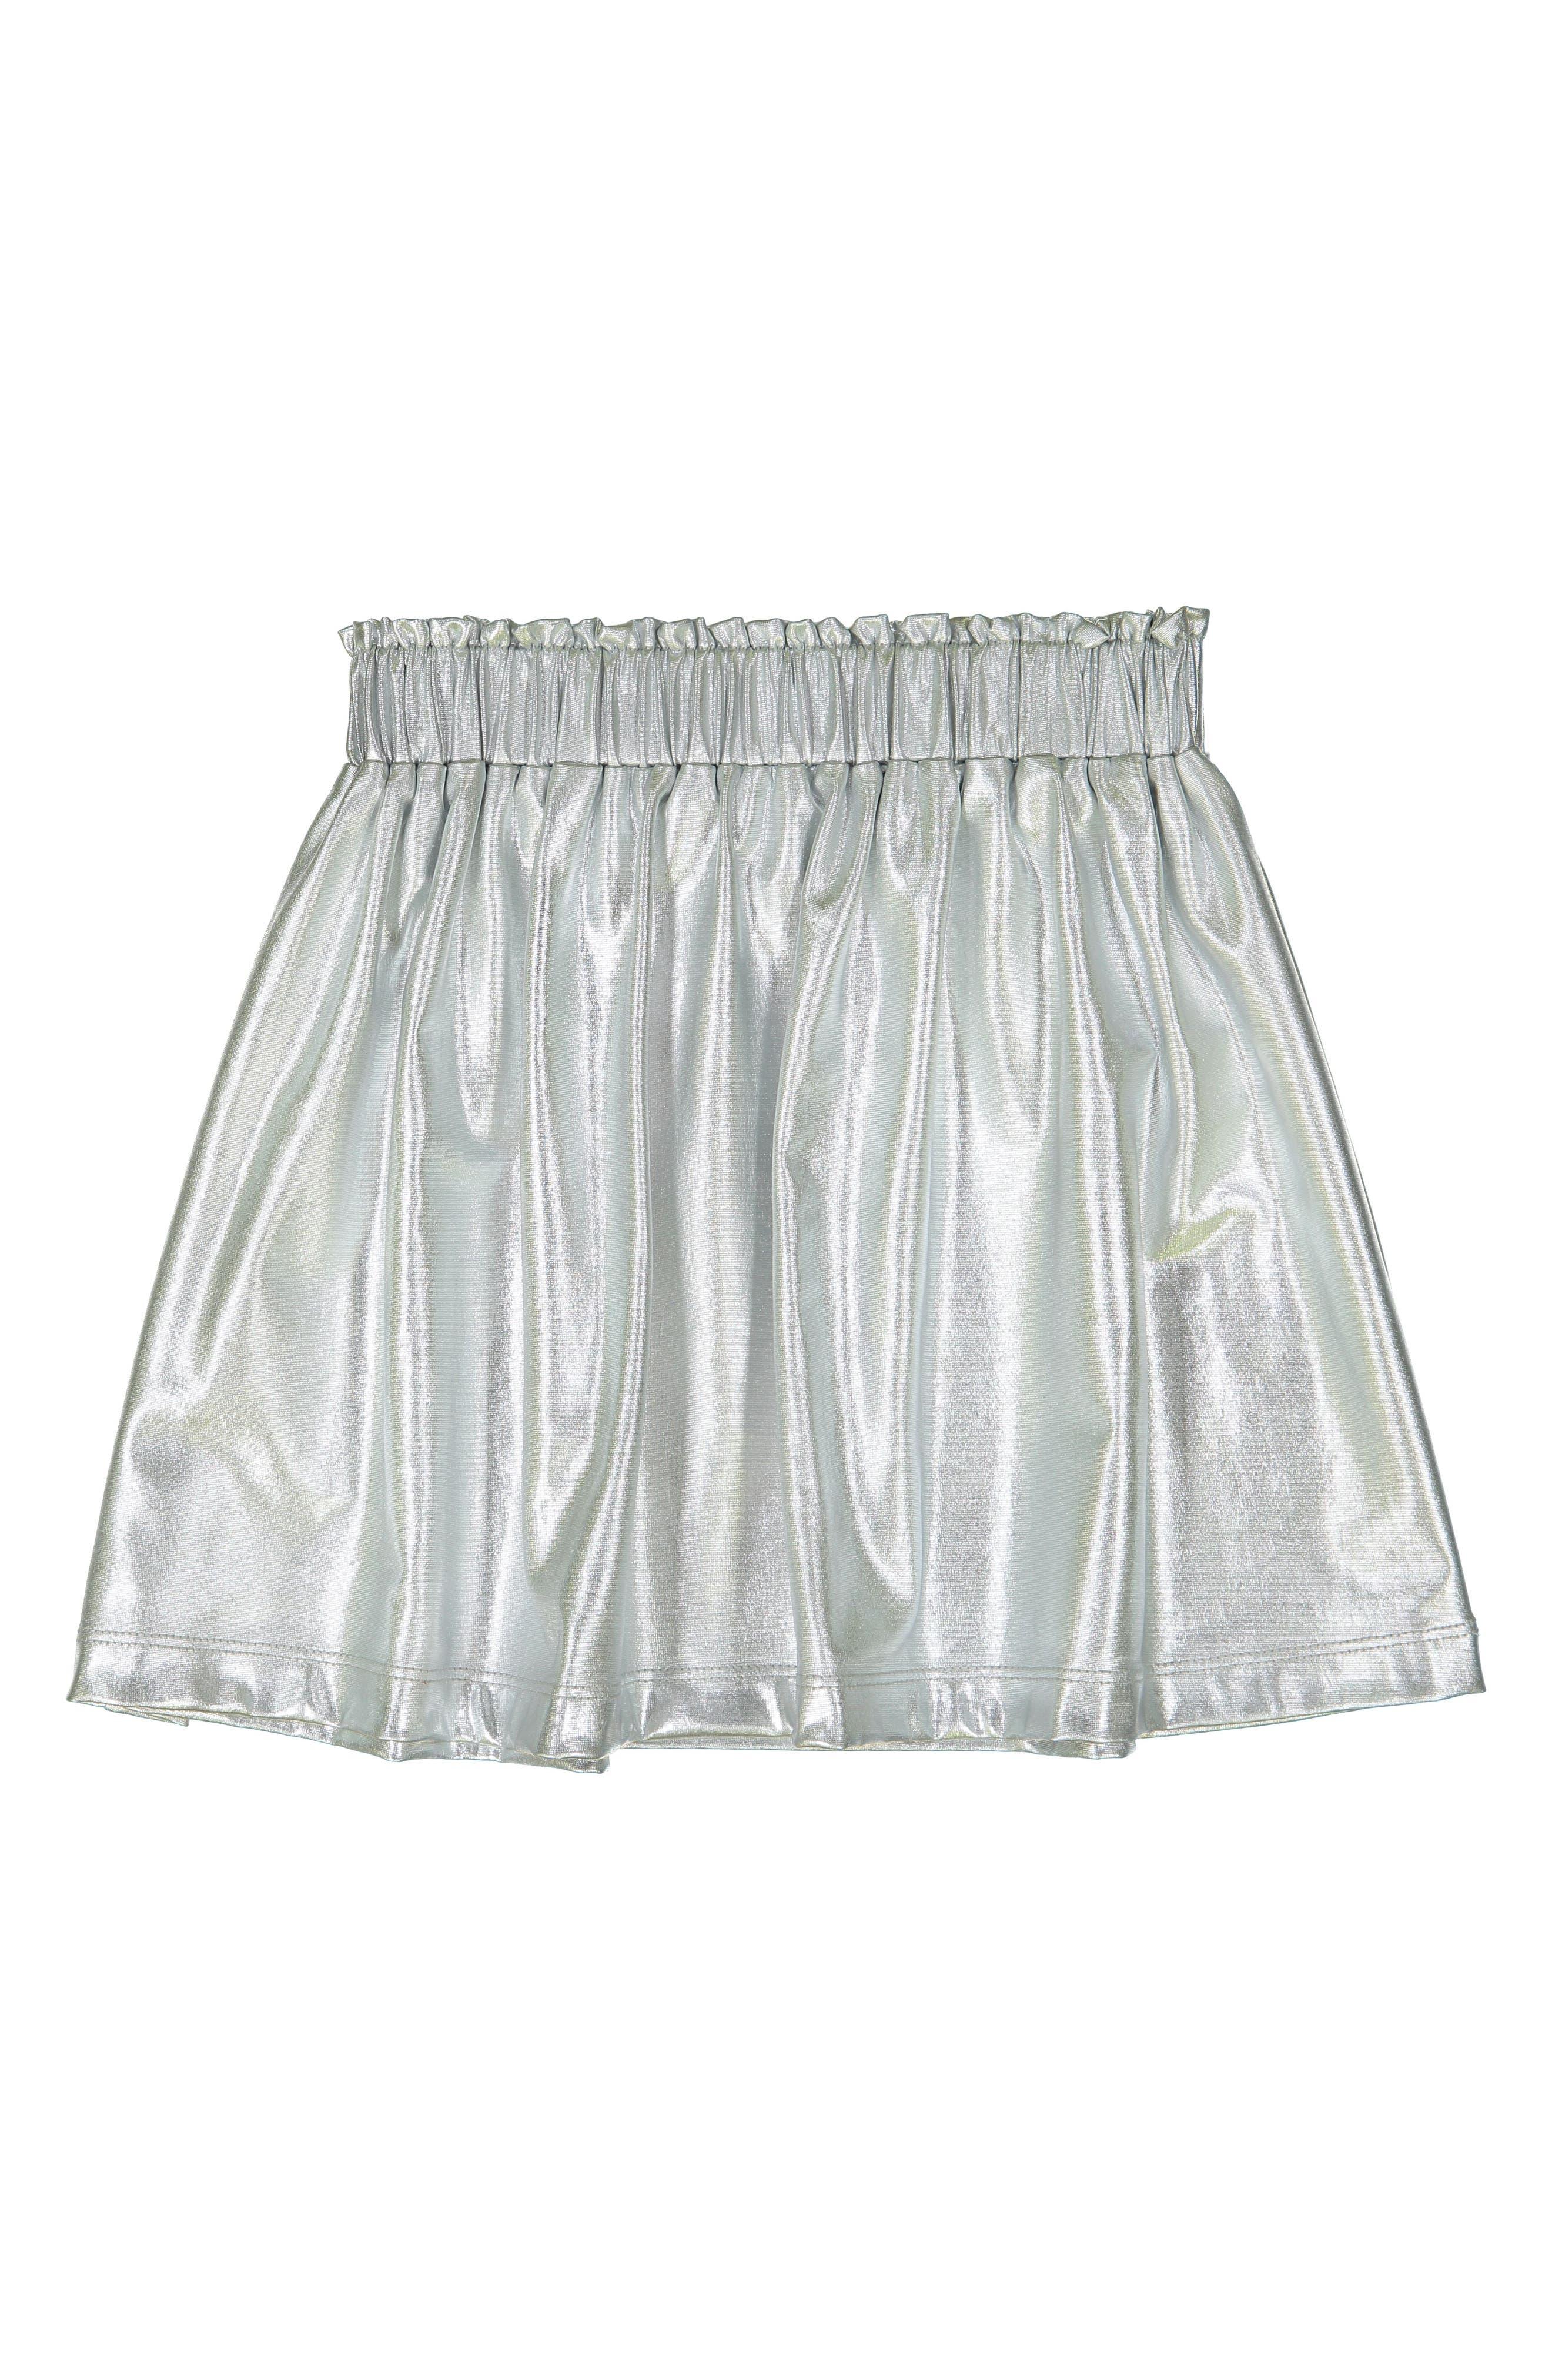 Silver Metallic Skirt,                             Main thumbnail 1, color,                             SILVER